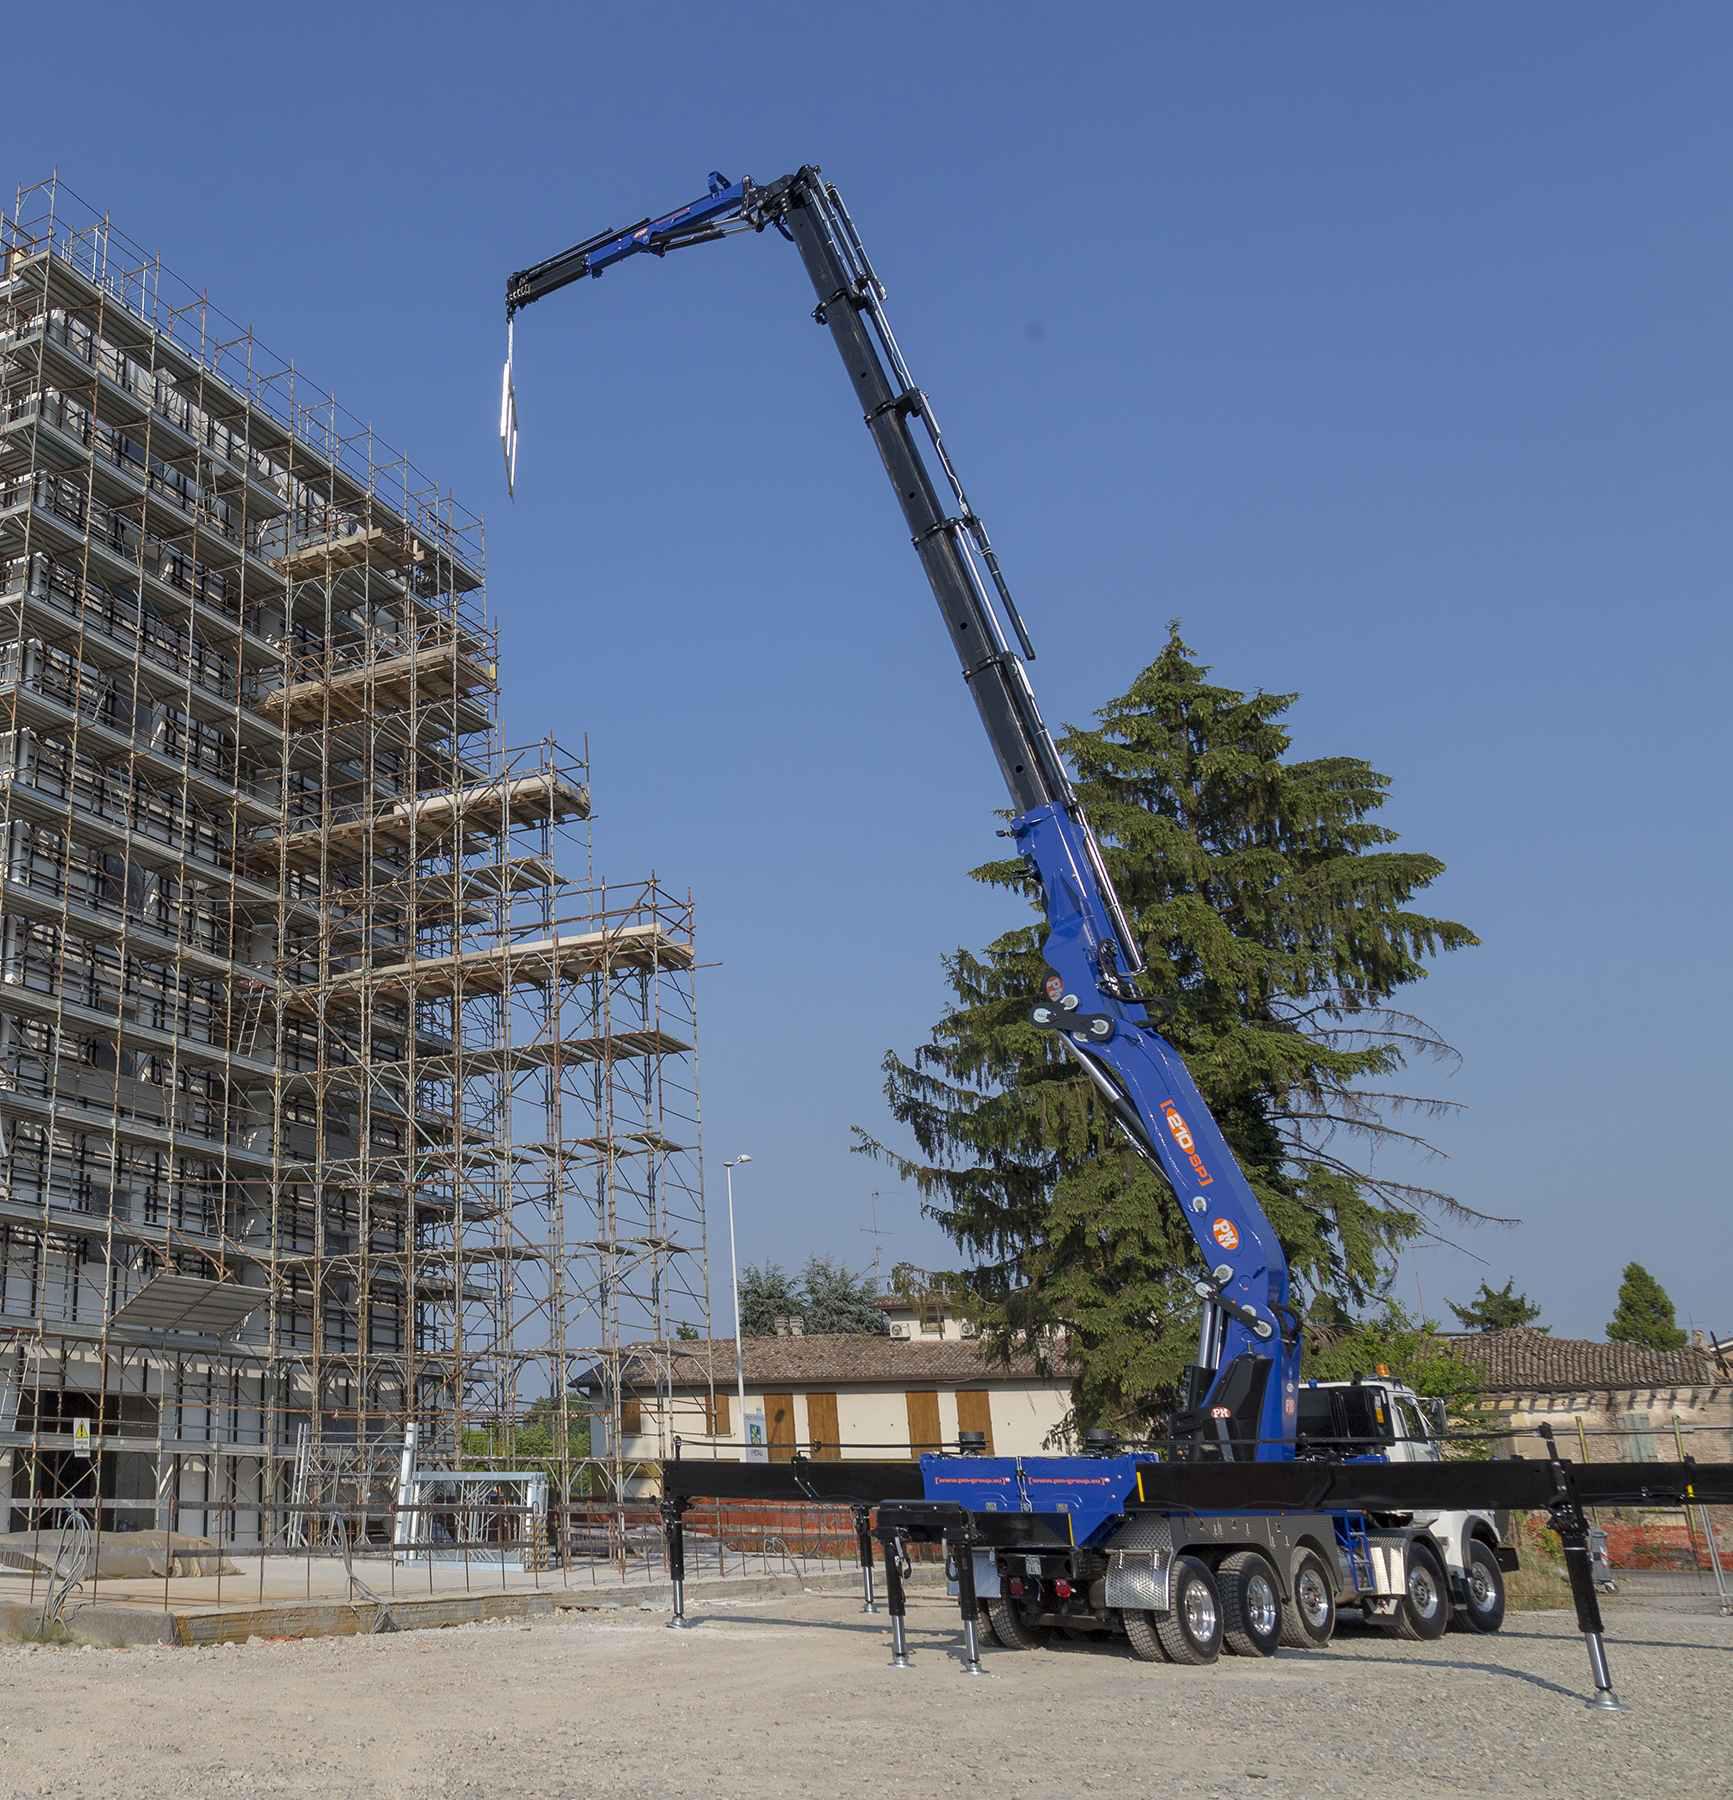 Manitex Crane working on construction project